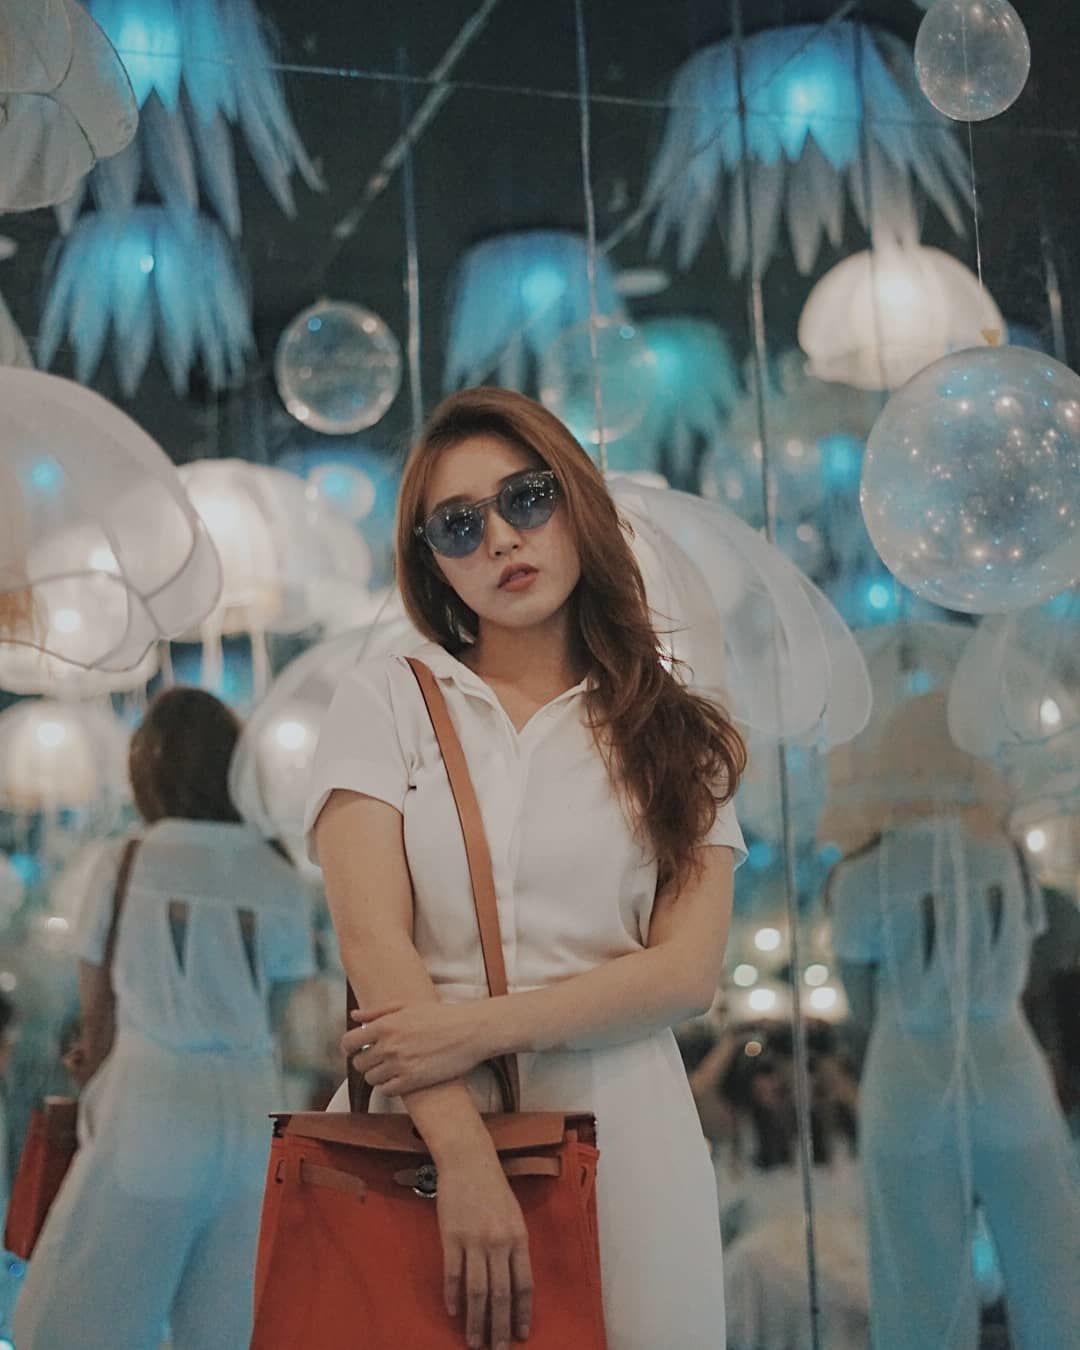 Suka Dangdut, Ini Fakta Menarik Shinta Naomi ex-JKT48